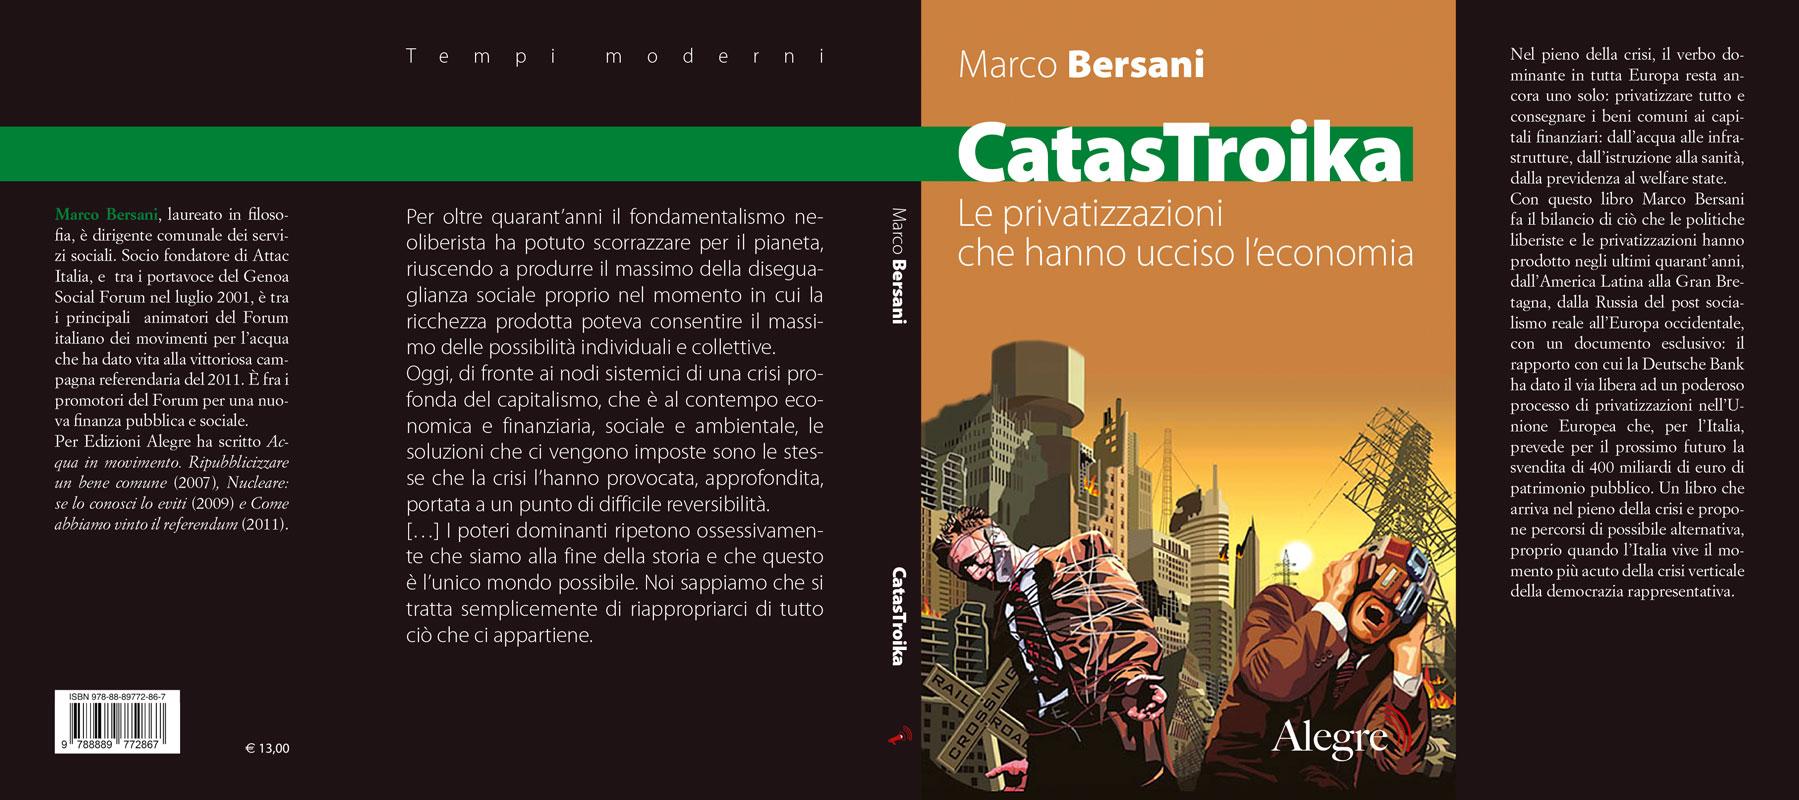 Marco Bersani, CatasTroika, stesa